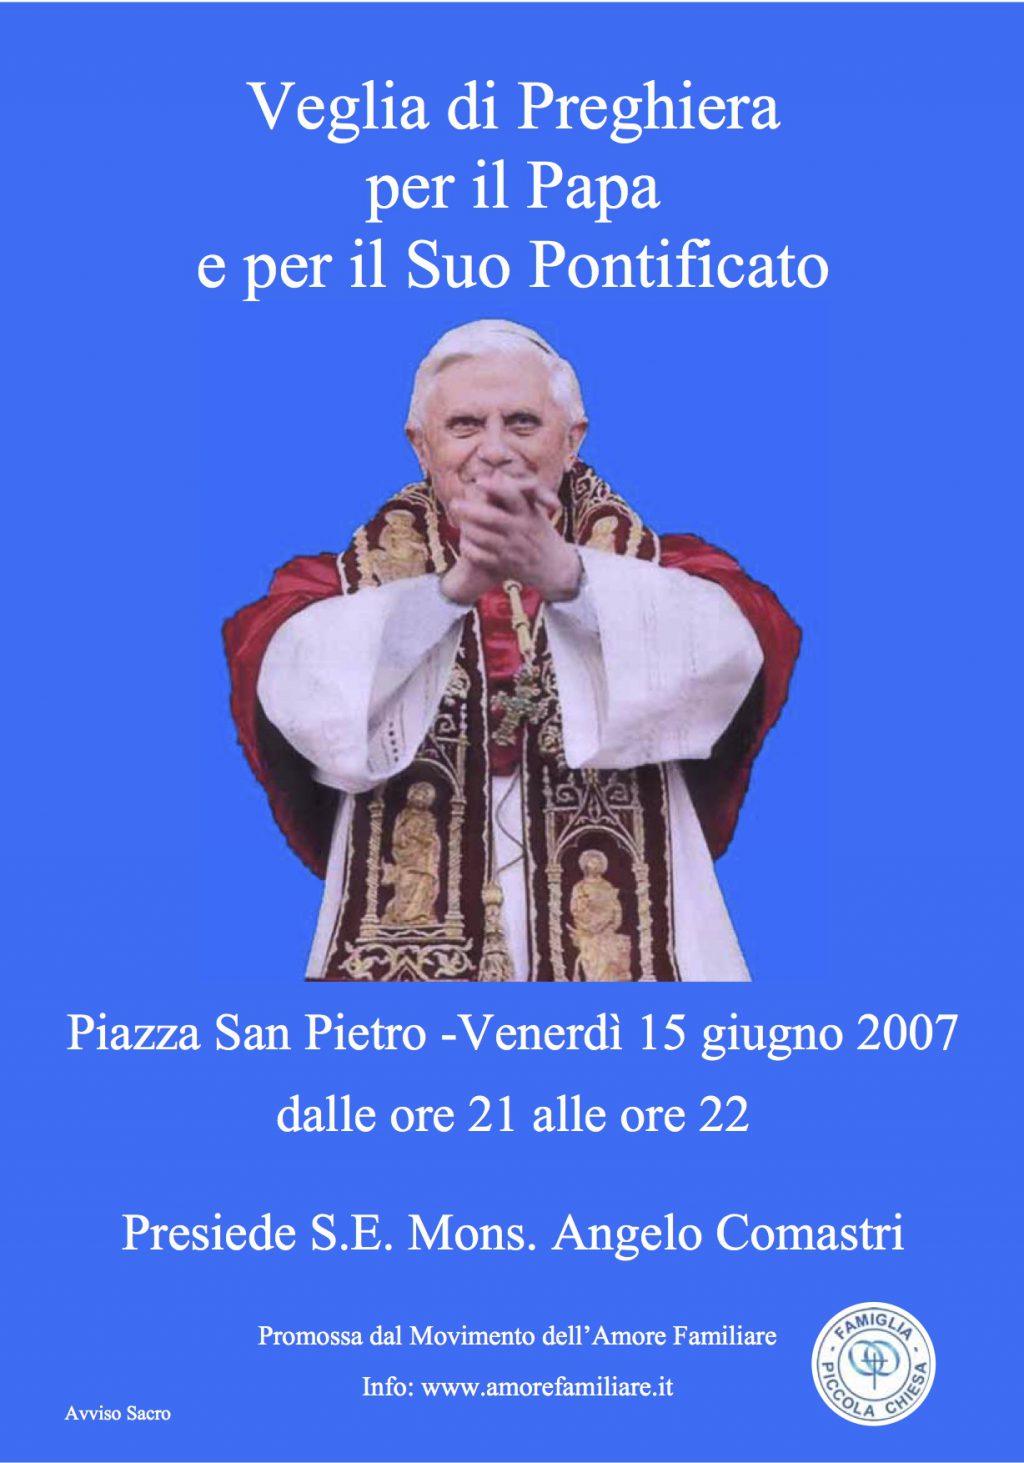 volantino veglia papa 2007